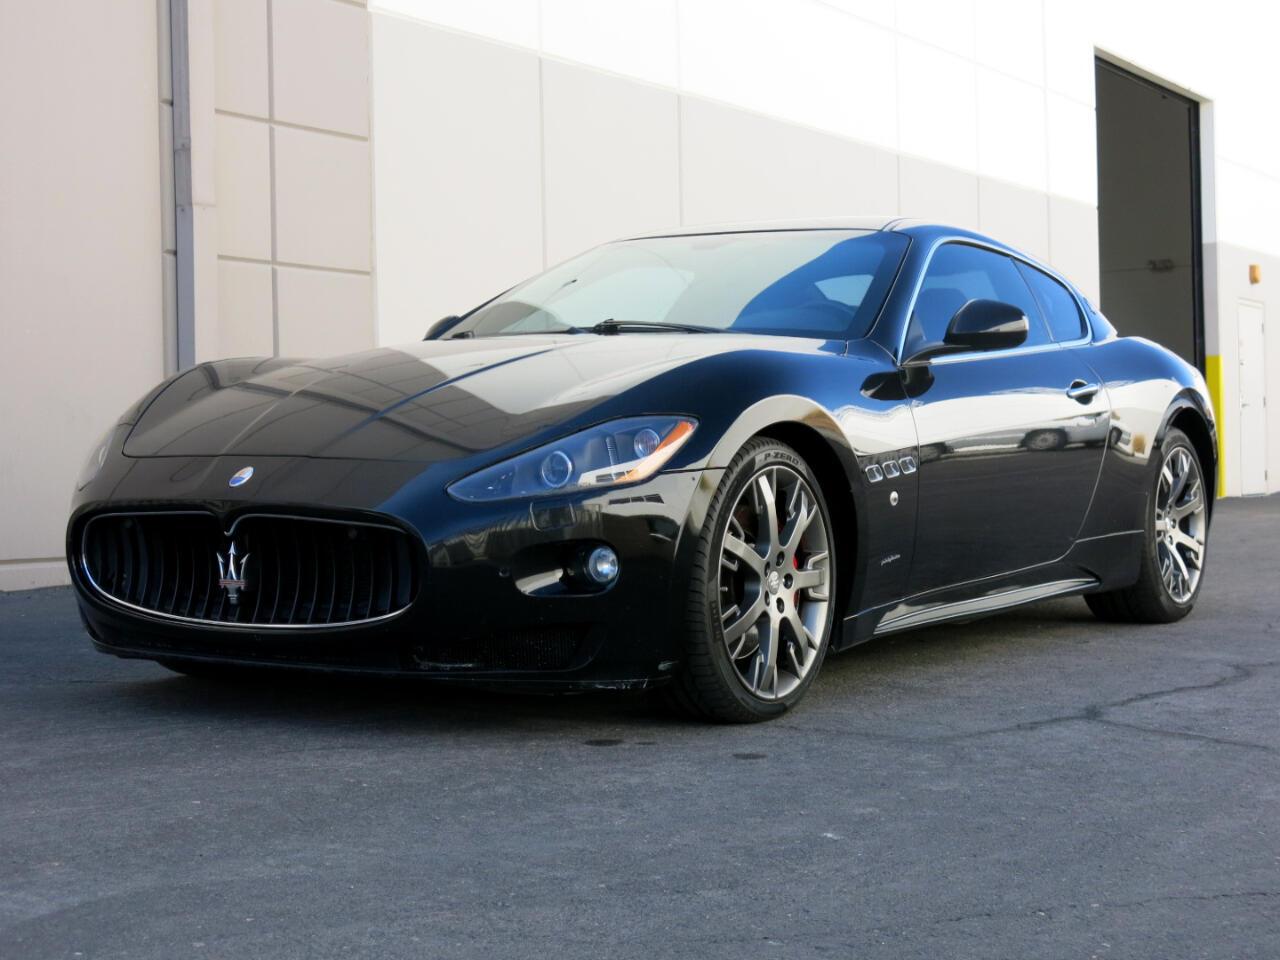 Maserati GranTurismo S 2009